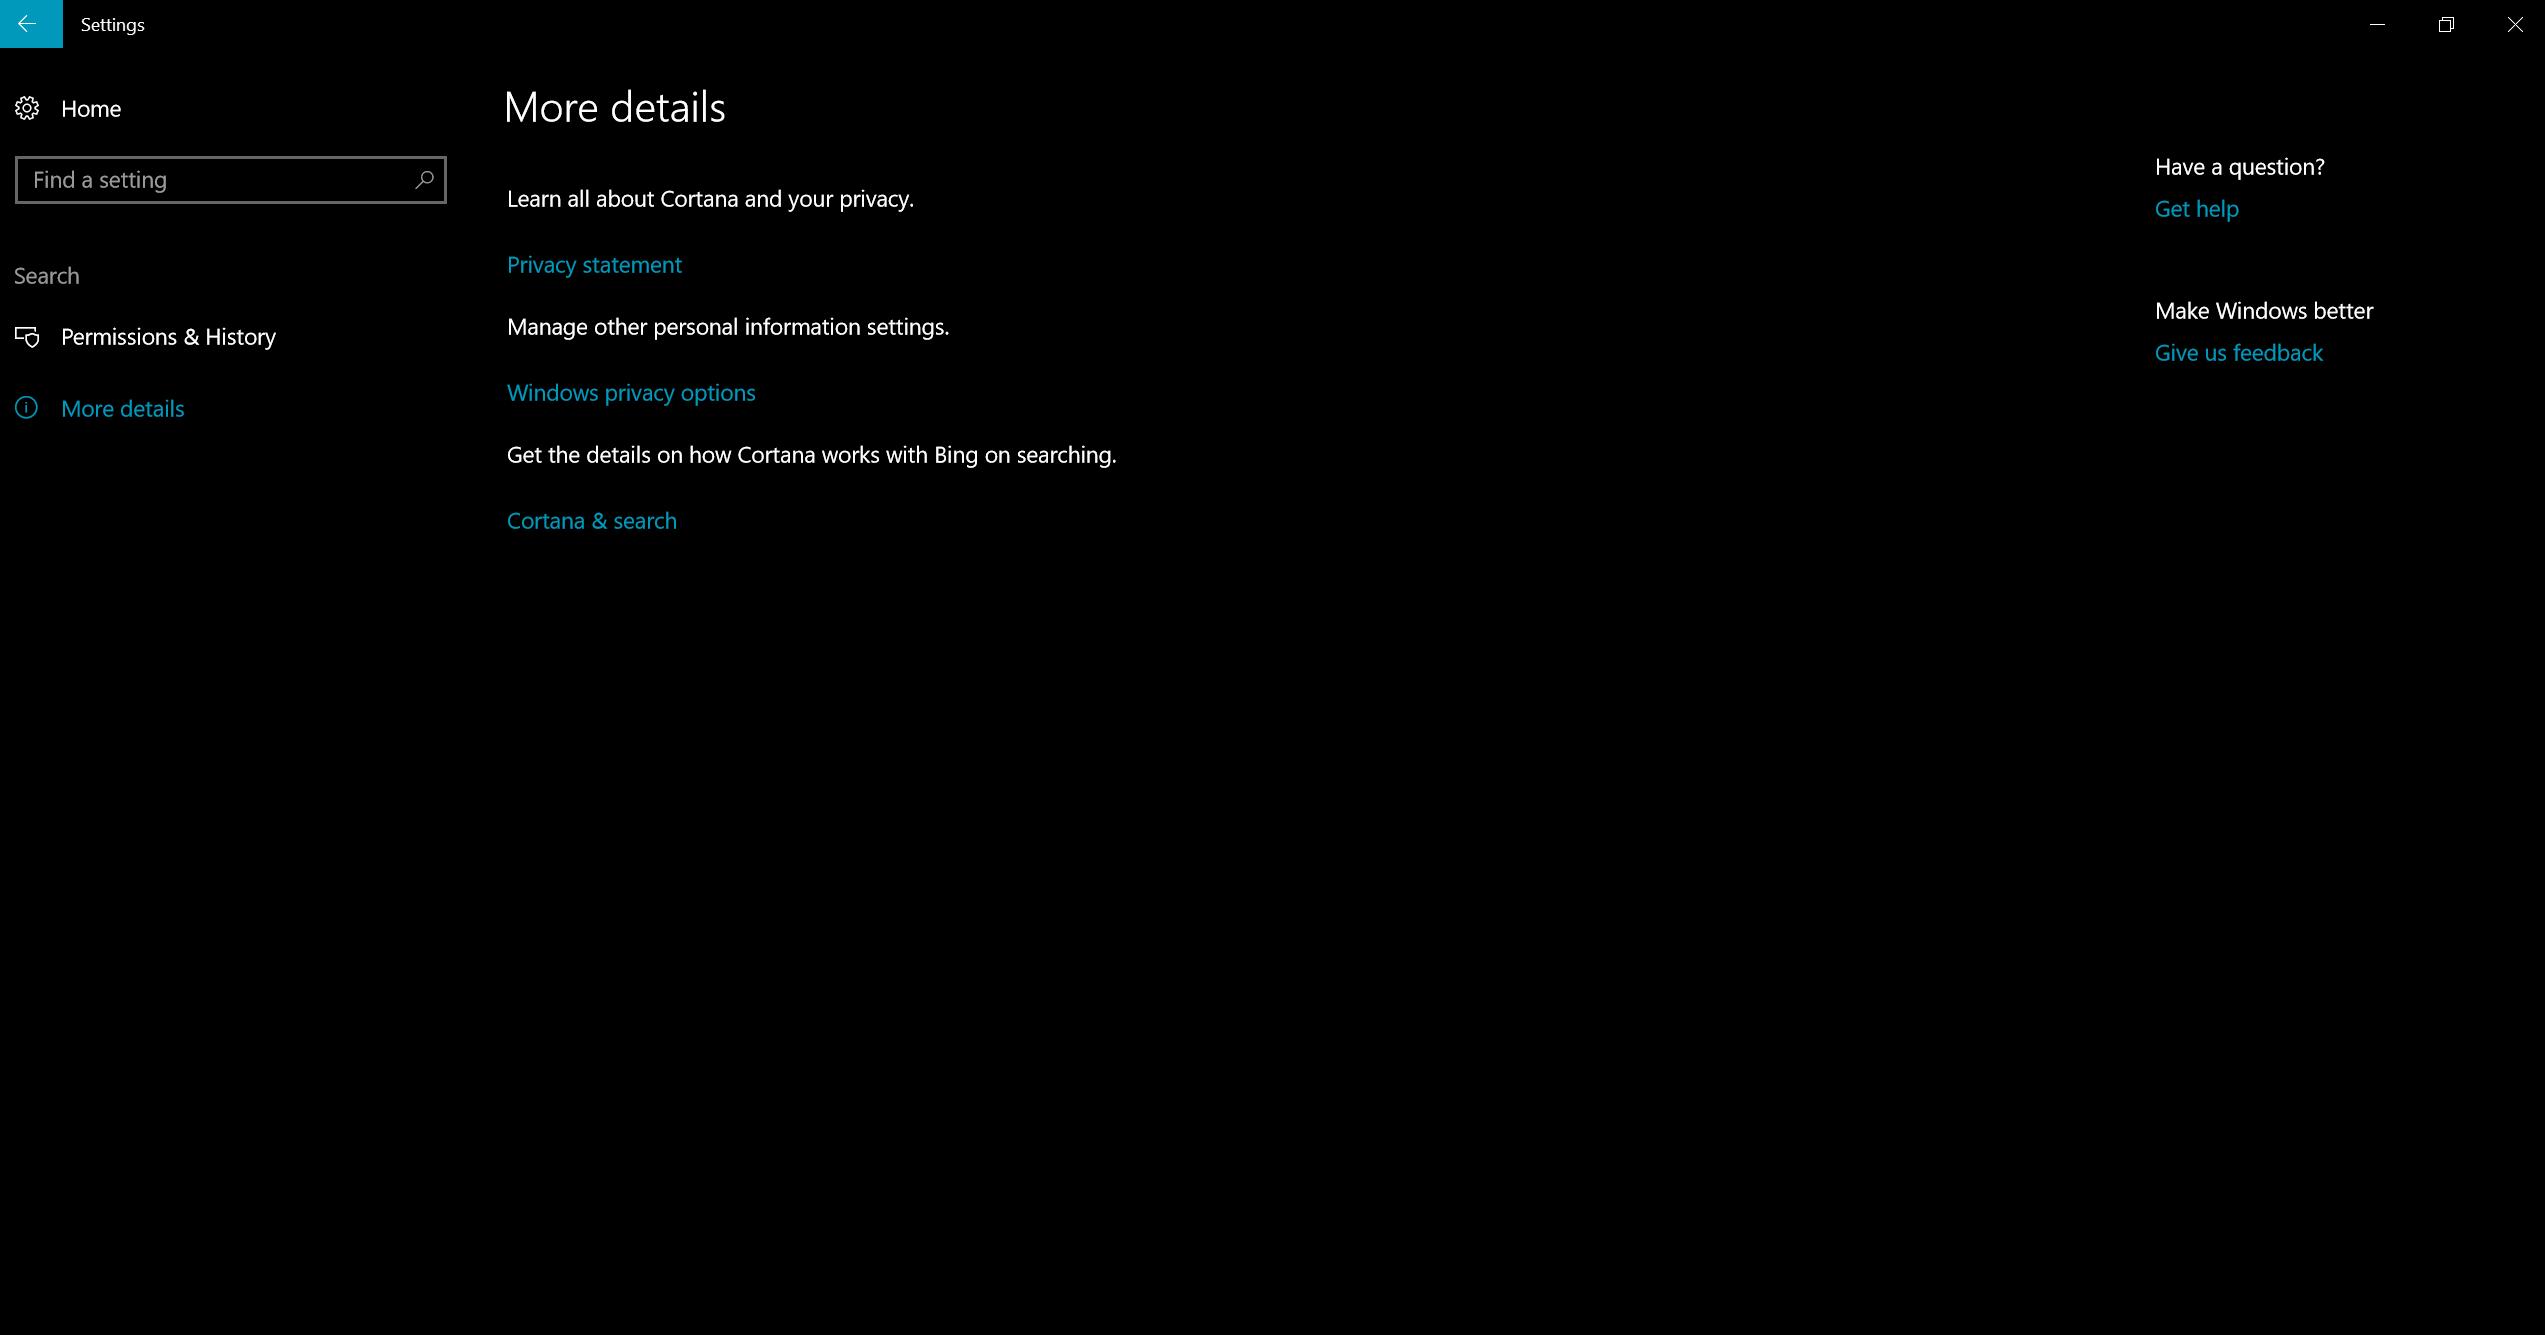 I chose not to enable Cortana on system setup  Now, I cannot